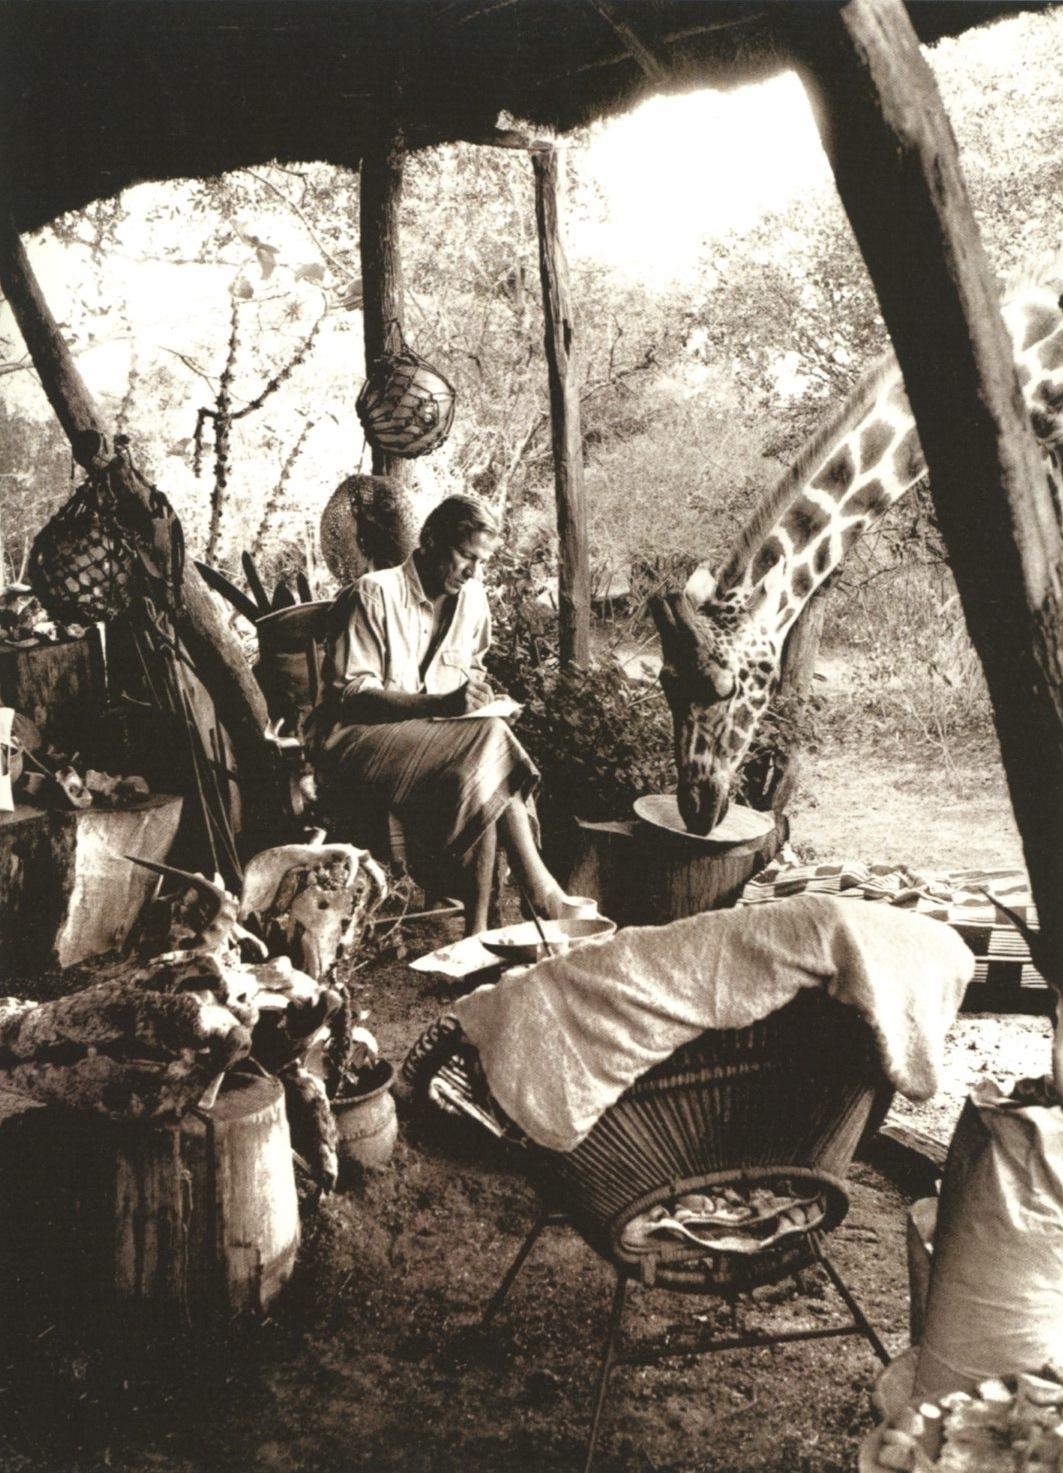 Peter Beard auf seiner Hog Ranch in Kenia Foto via ironcrowvintage.com